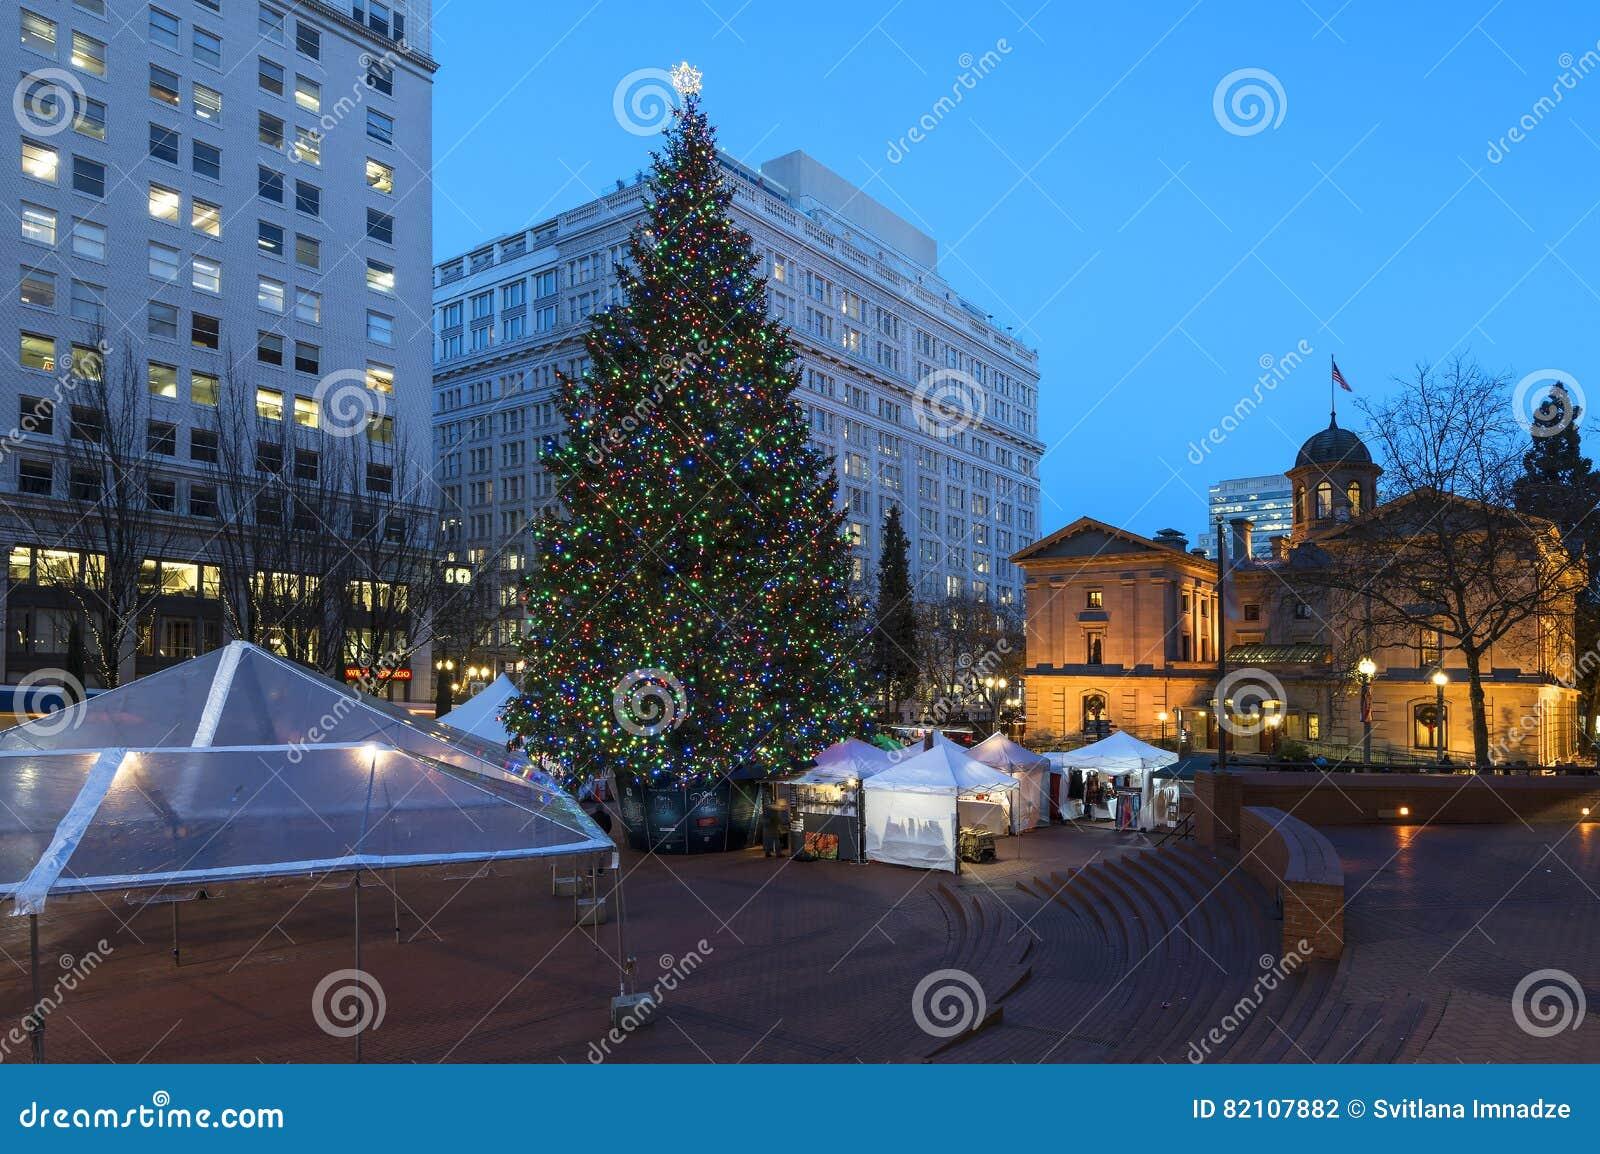 Portland Christmas Tree.Christmas Tree In Portland Or Editorial Photography Image